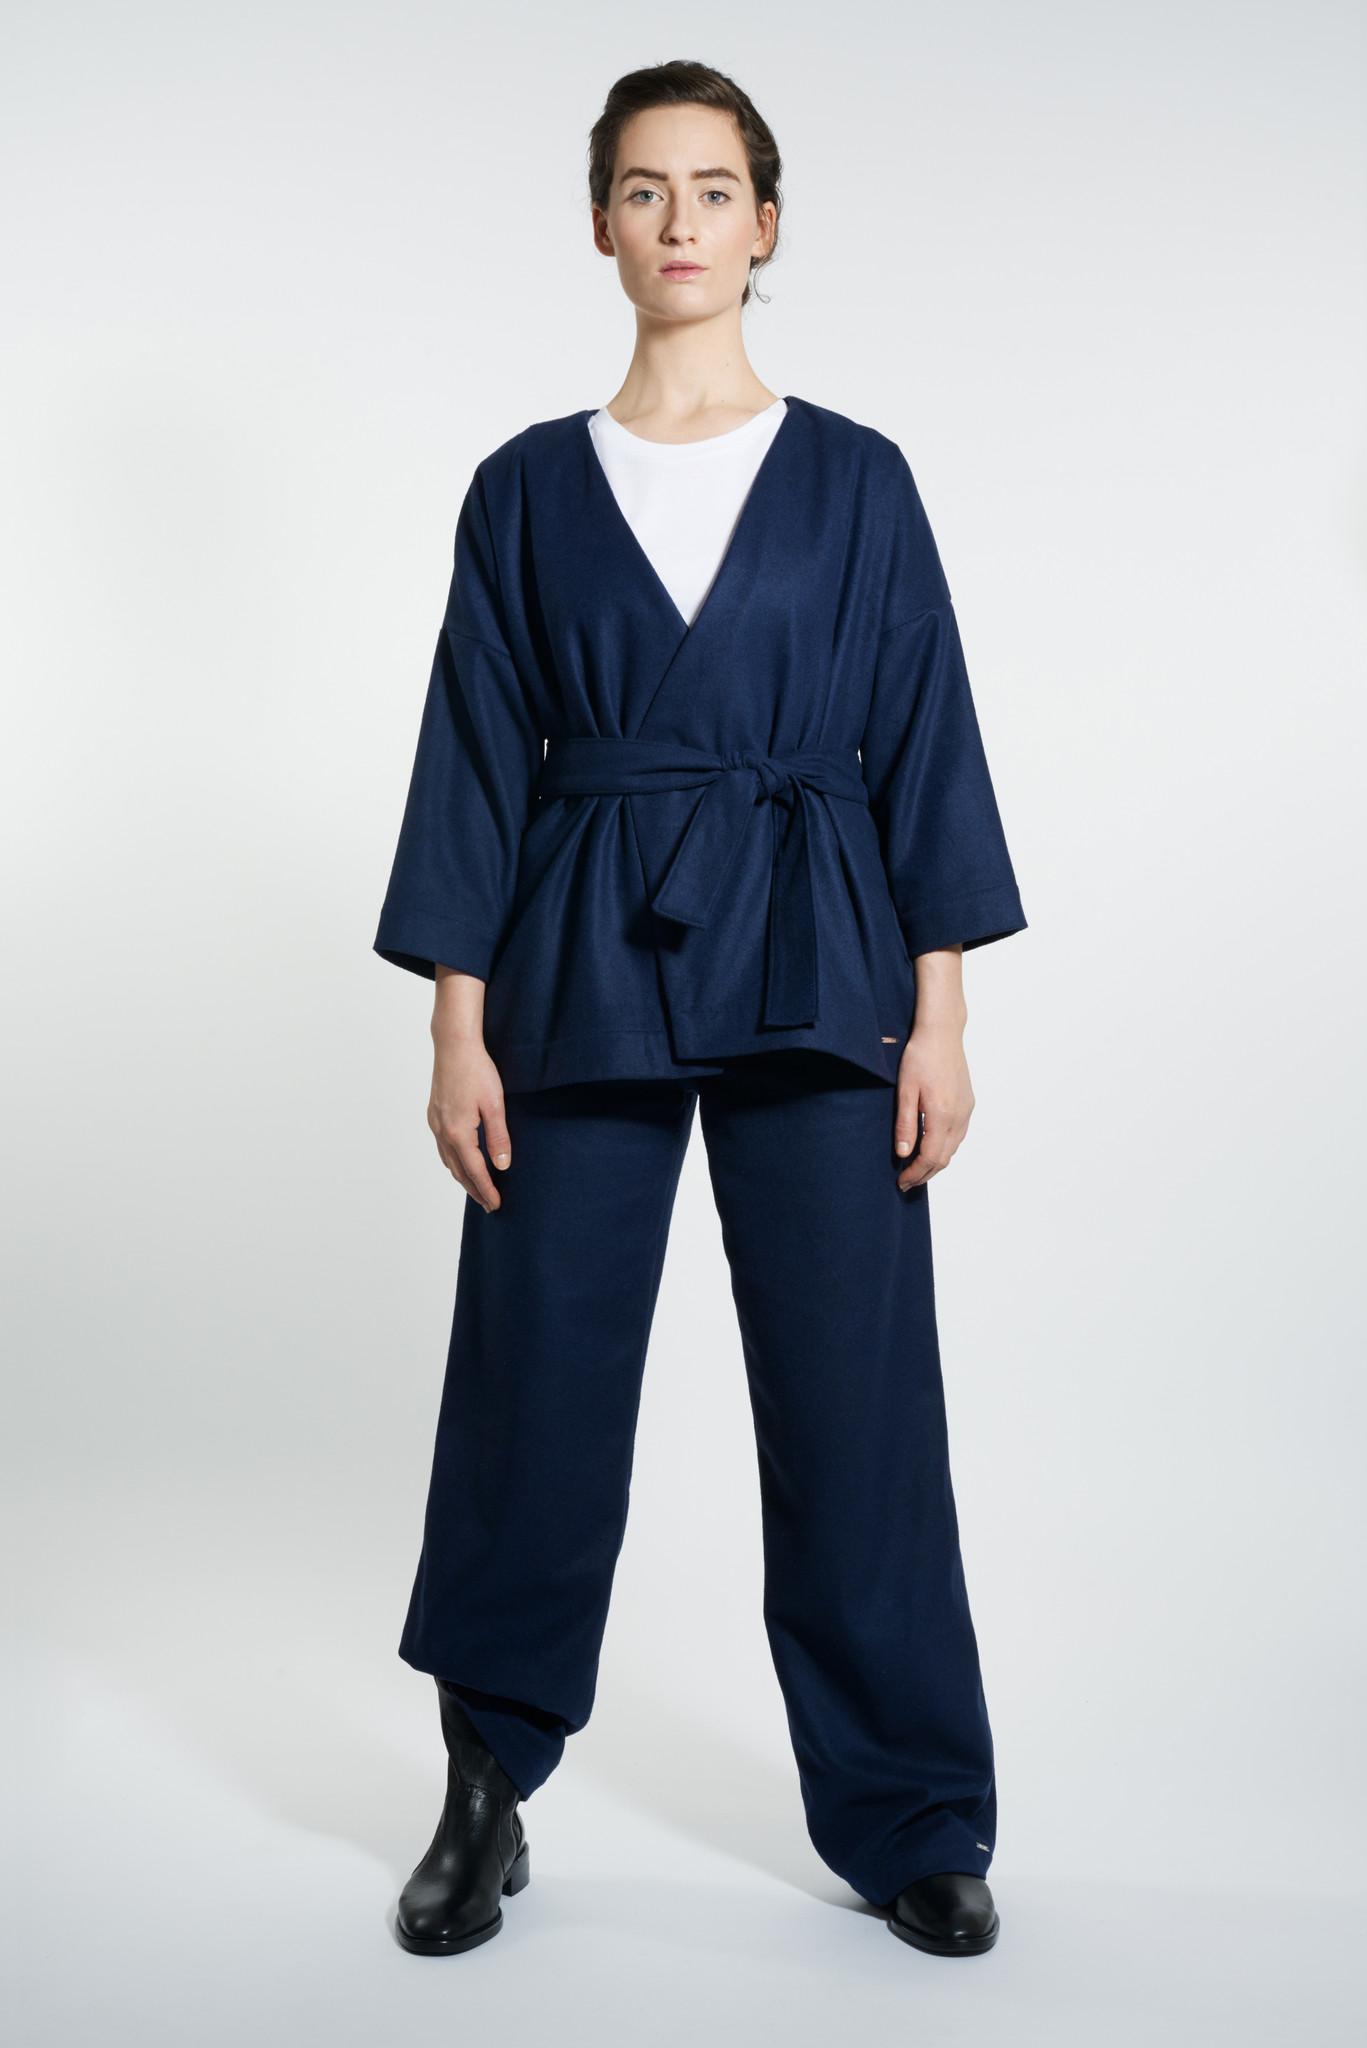 Kimono wool blend jacket - navy-1